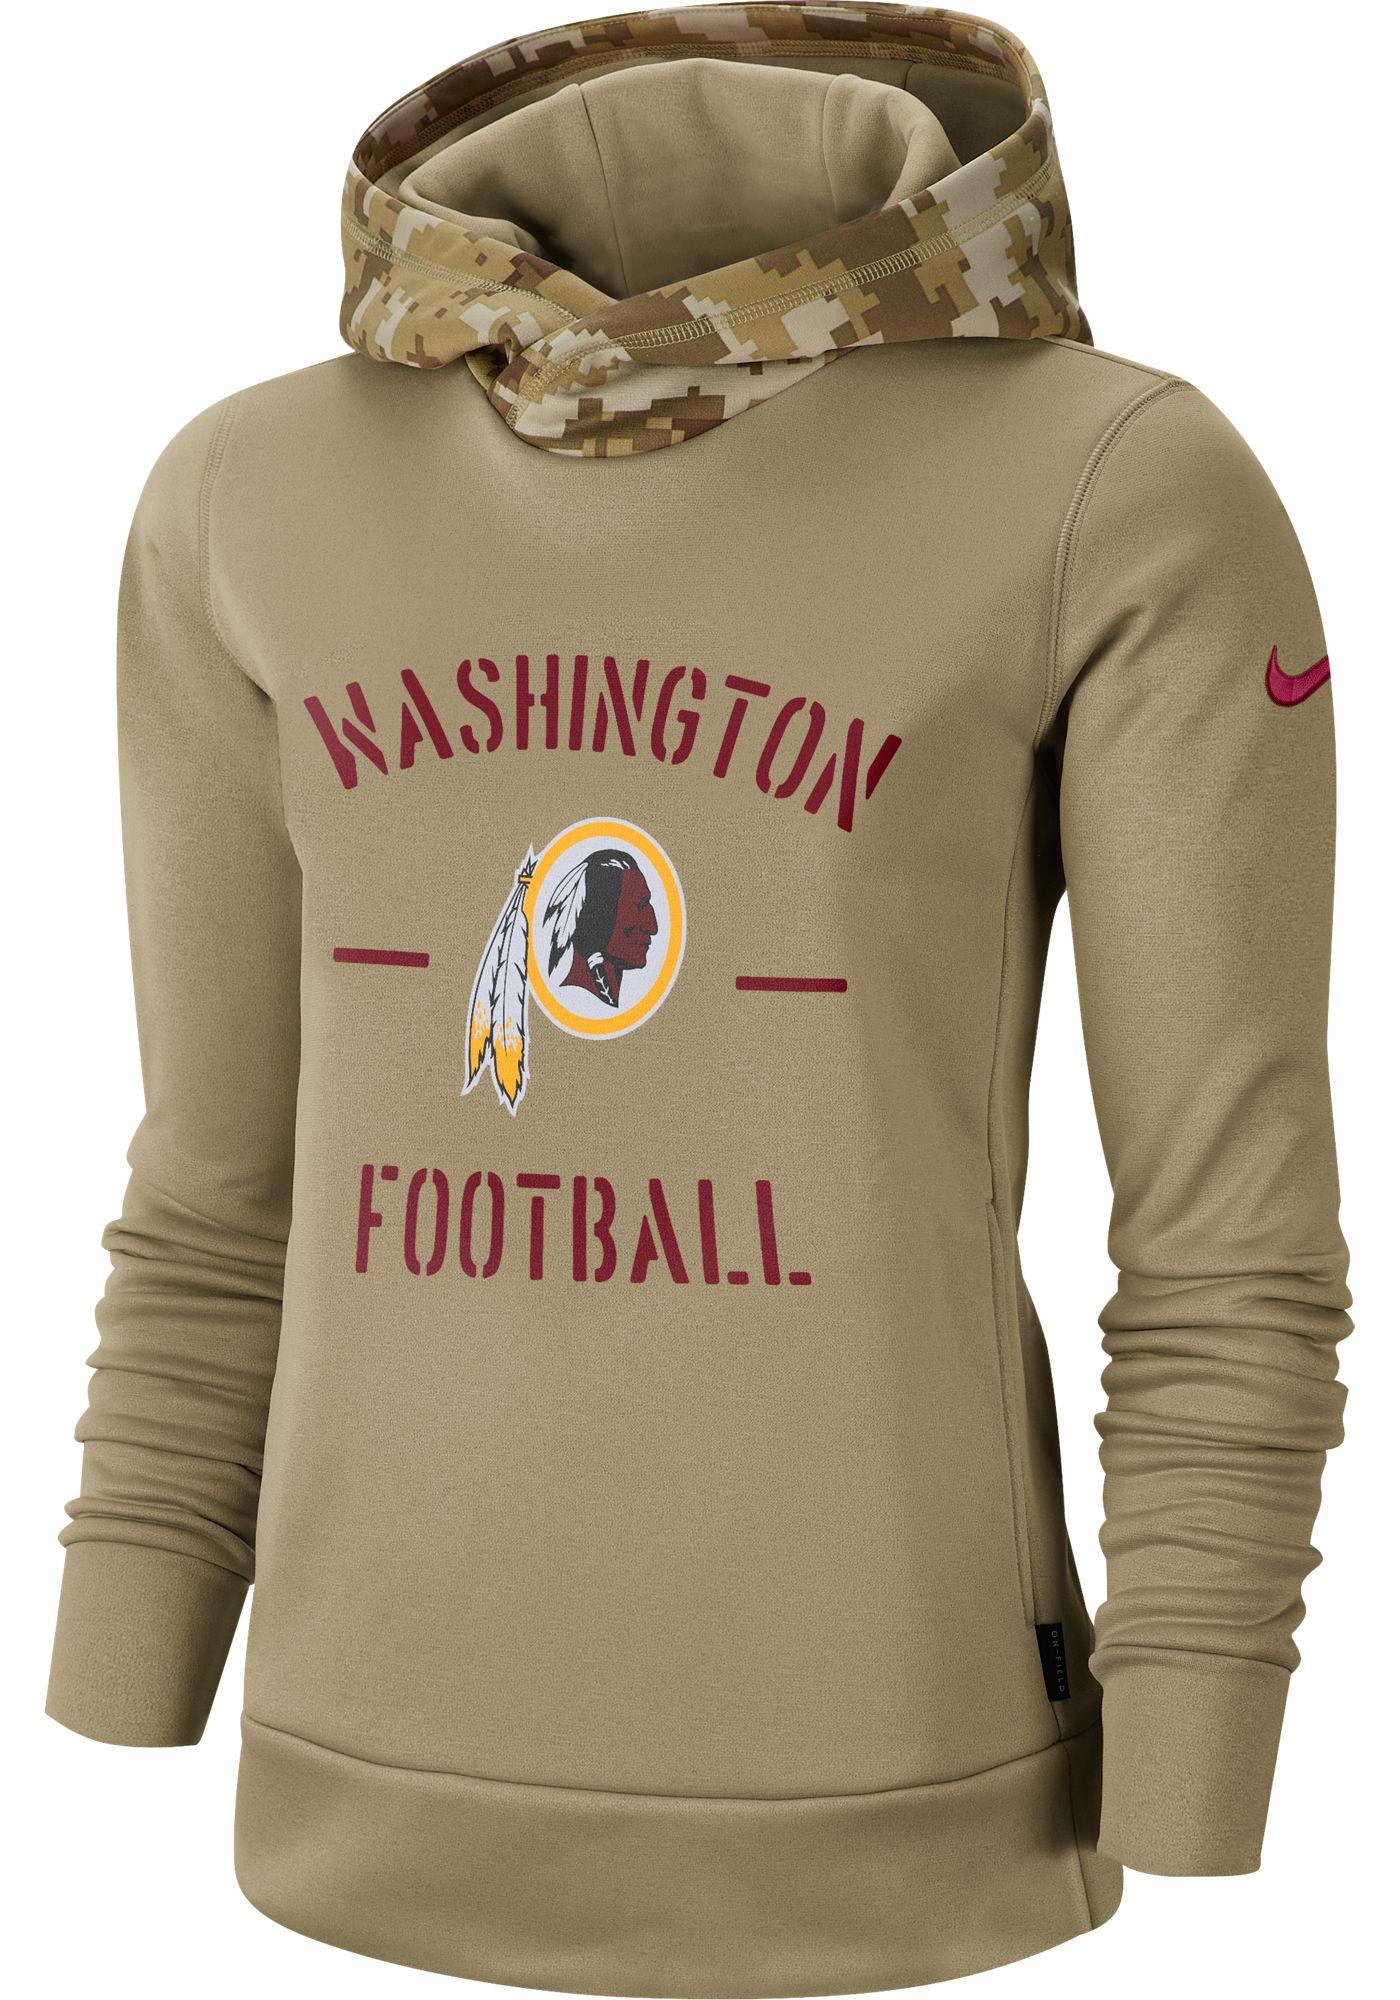 Nike Women's Salute to Service Washington Redskins Therma-FIT Beige Camo Hoodie